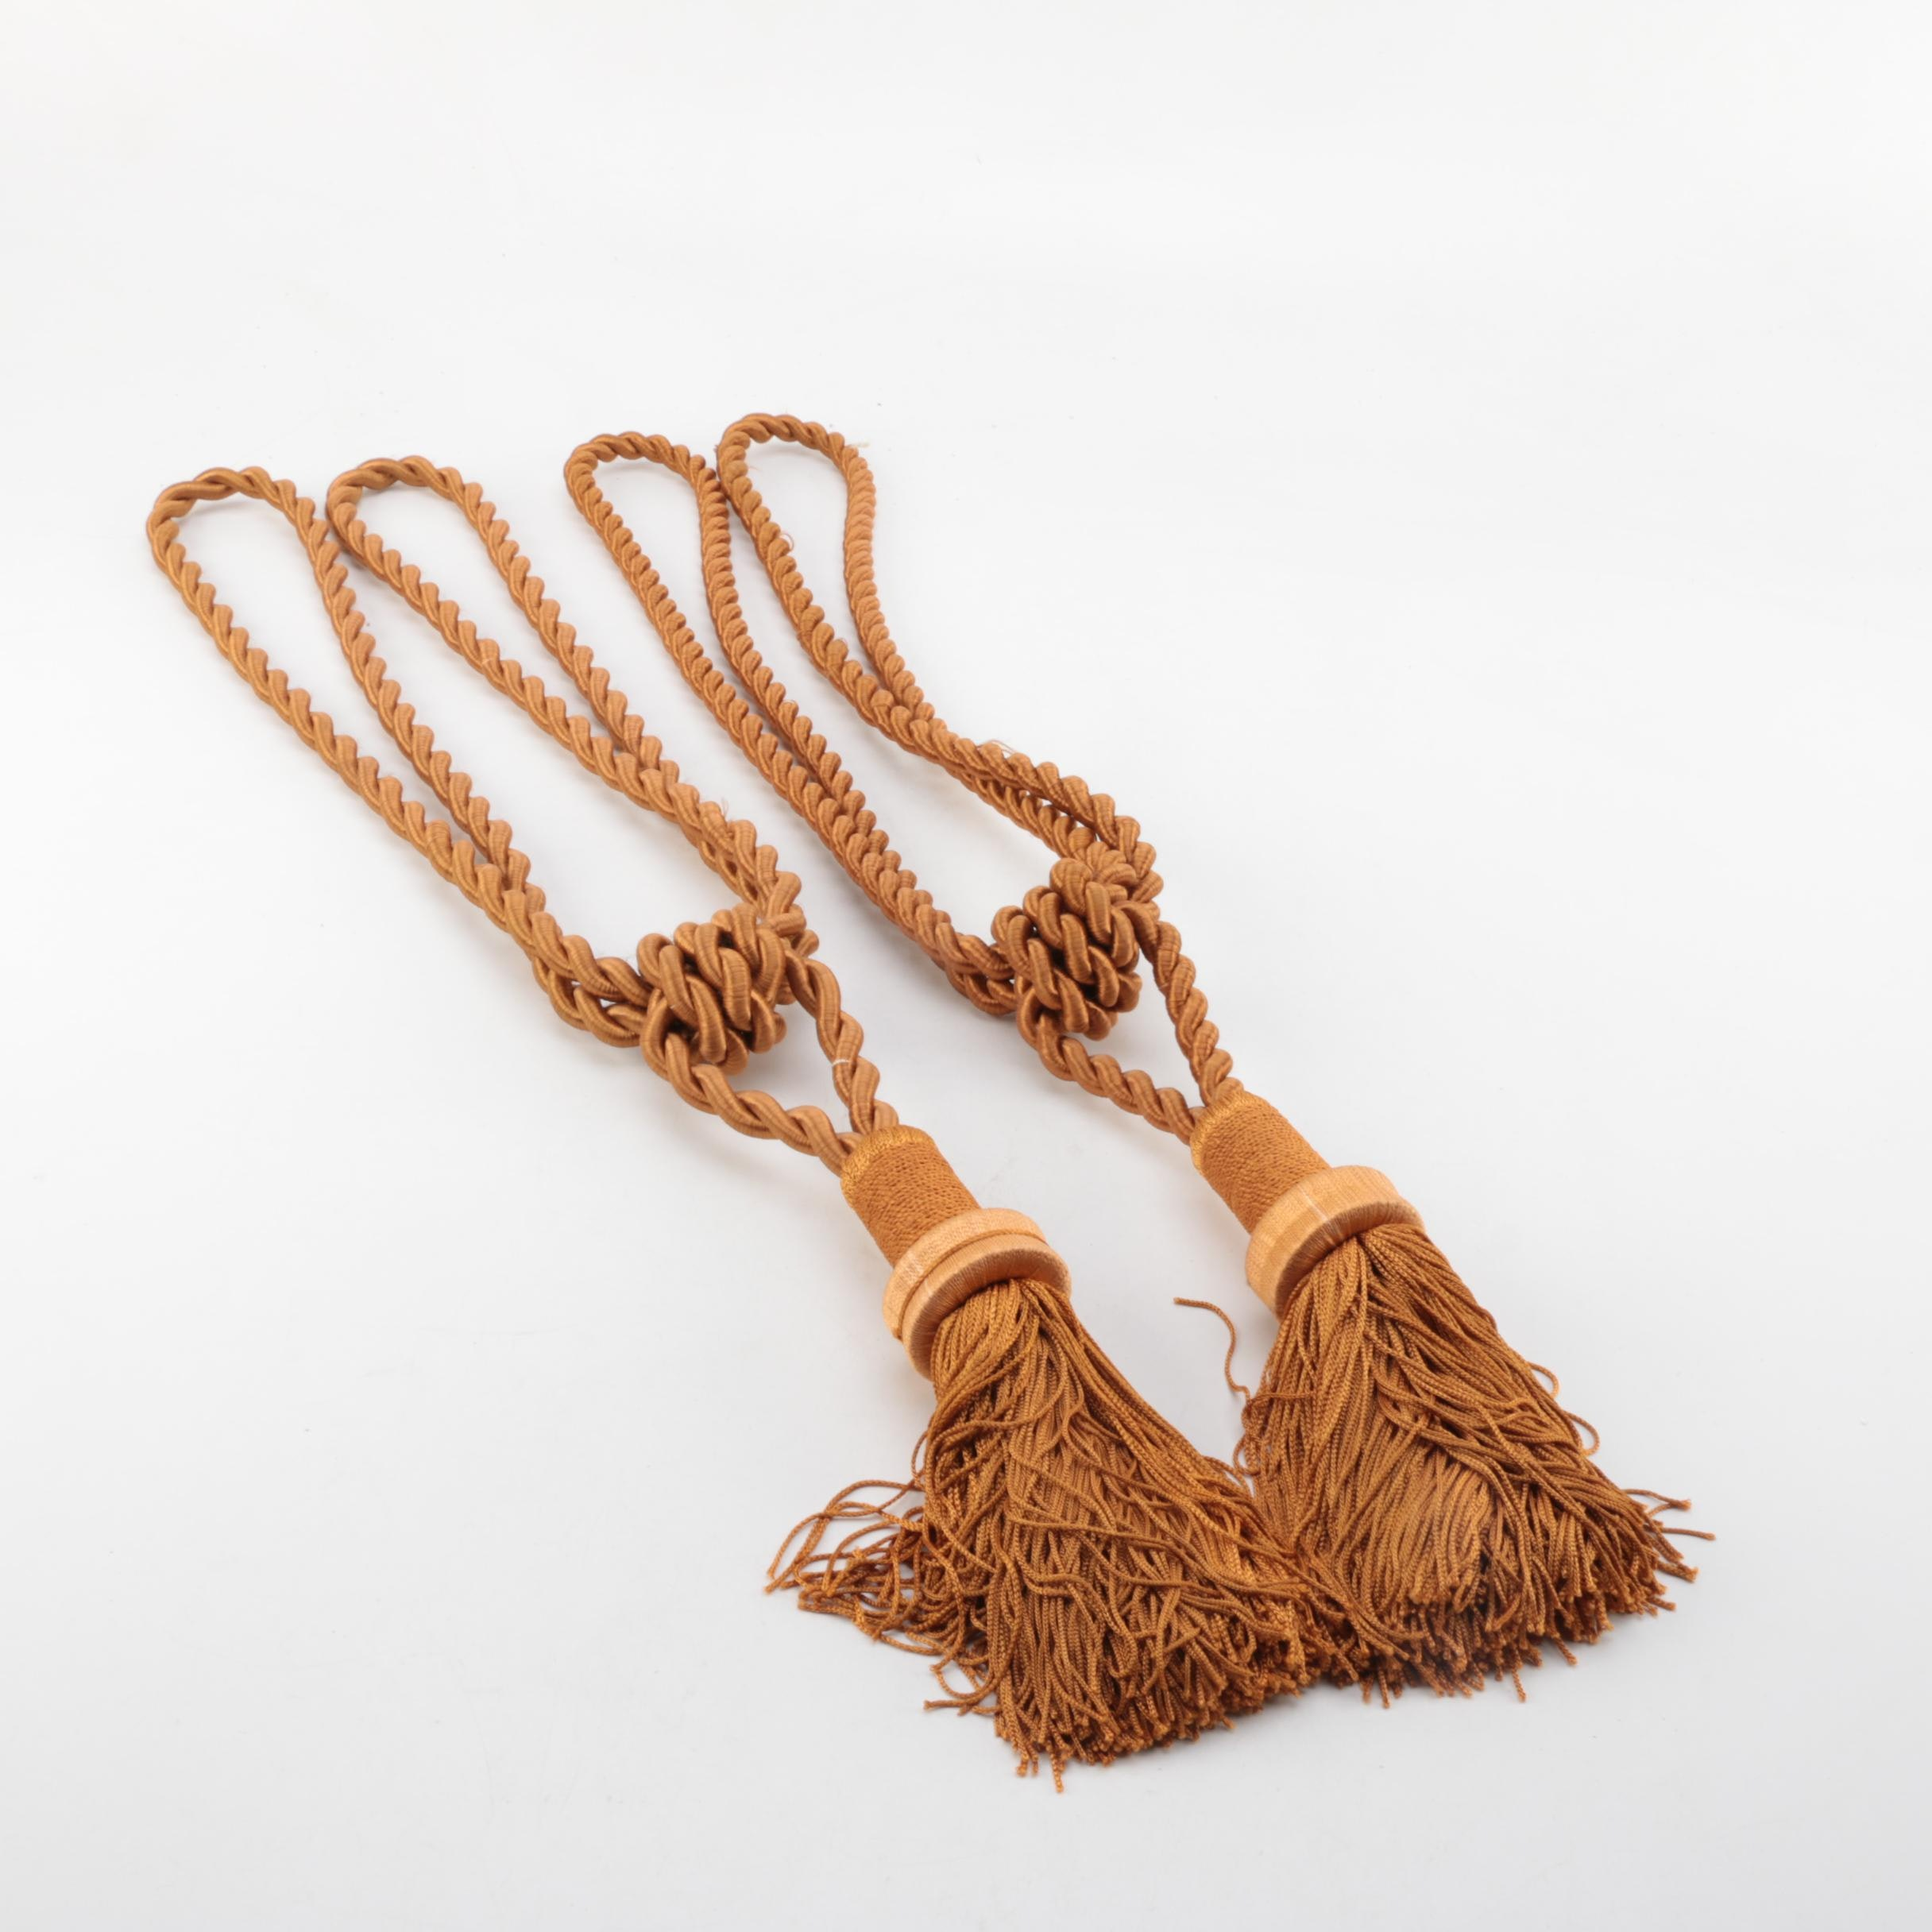 Decorative Orange Braided and Tasseled Curtain Tie-Backs